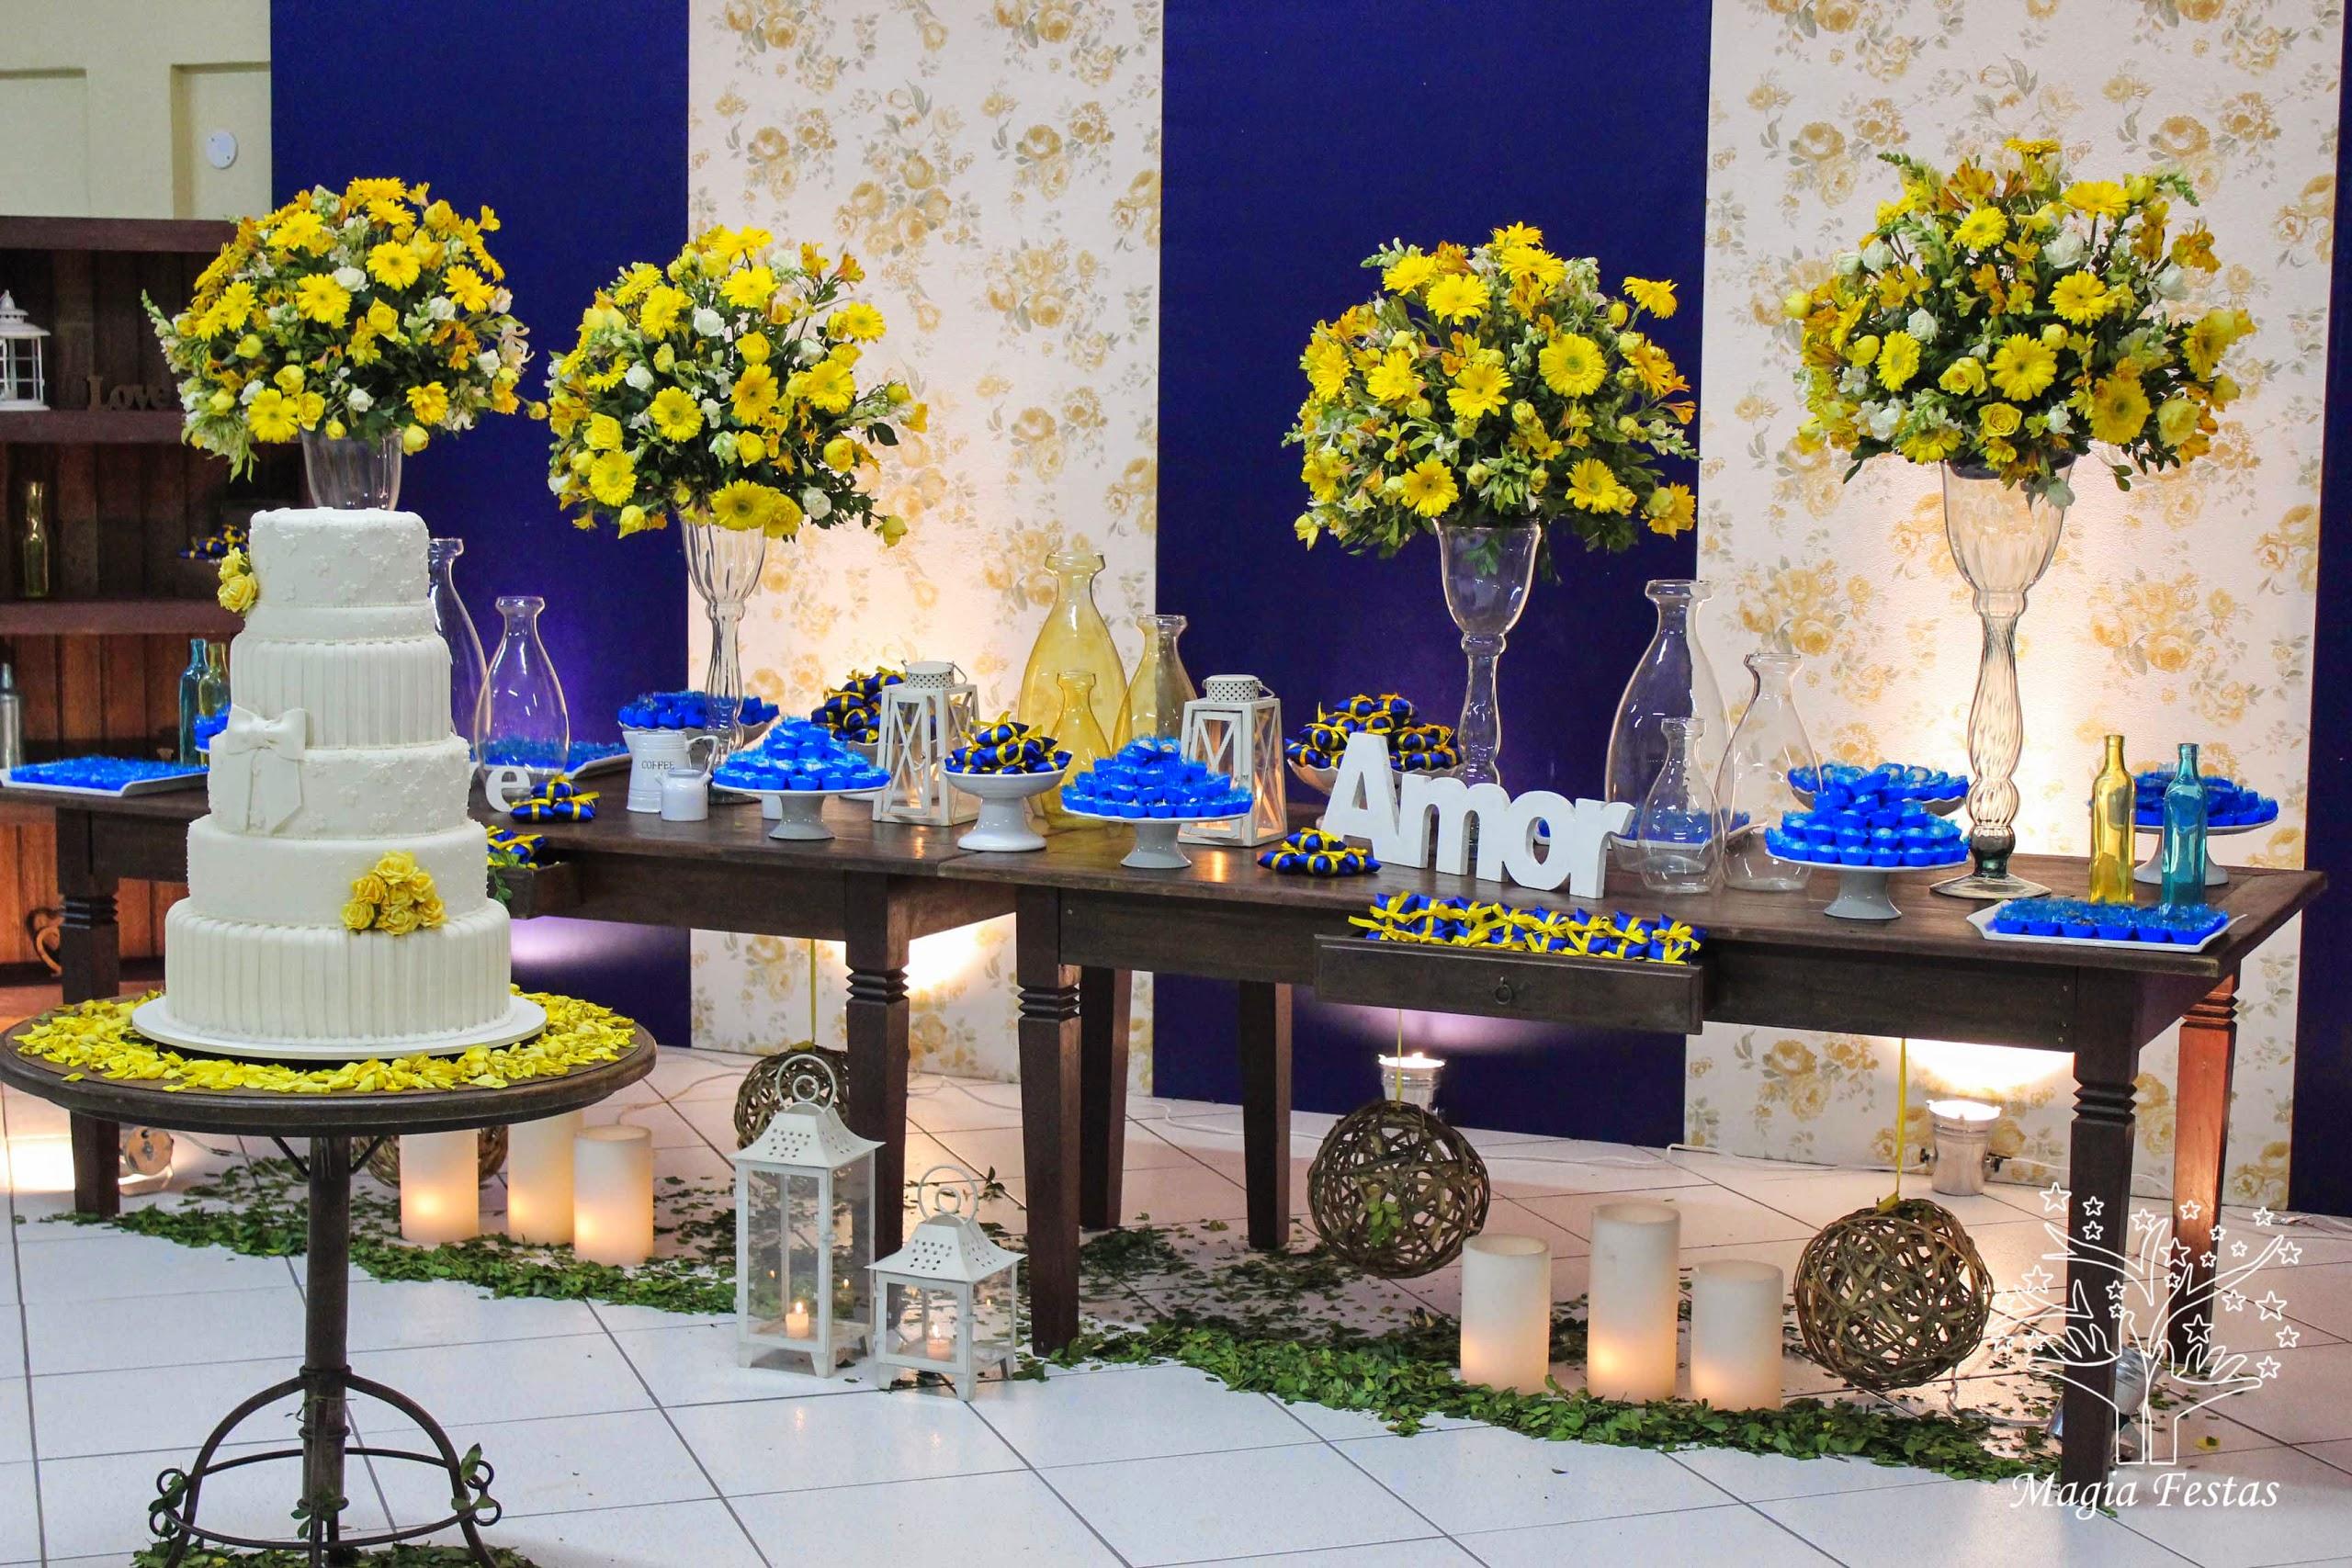 decoracao casamento rustico azul e amarelo : decoracao casamento rustico azul e amarelo: Magia Festas: Evento proprio – casamento rústico amarelo e azul